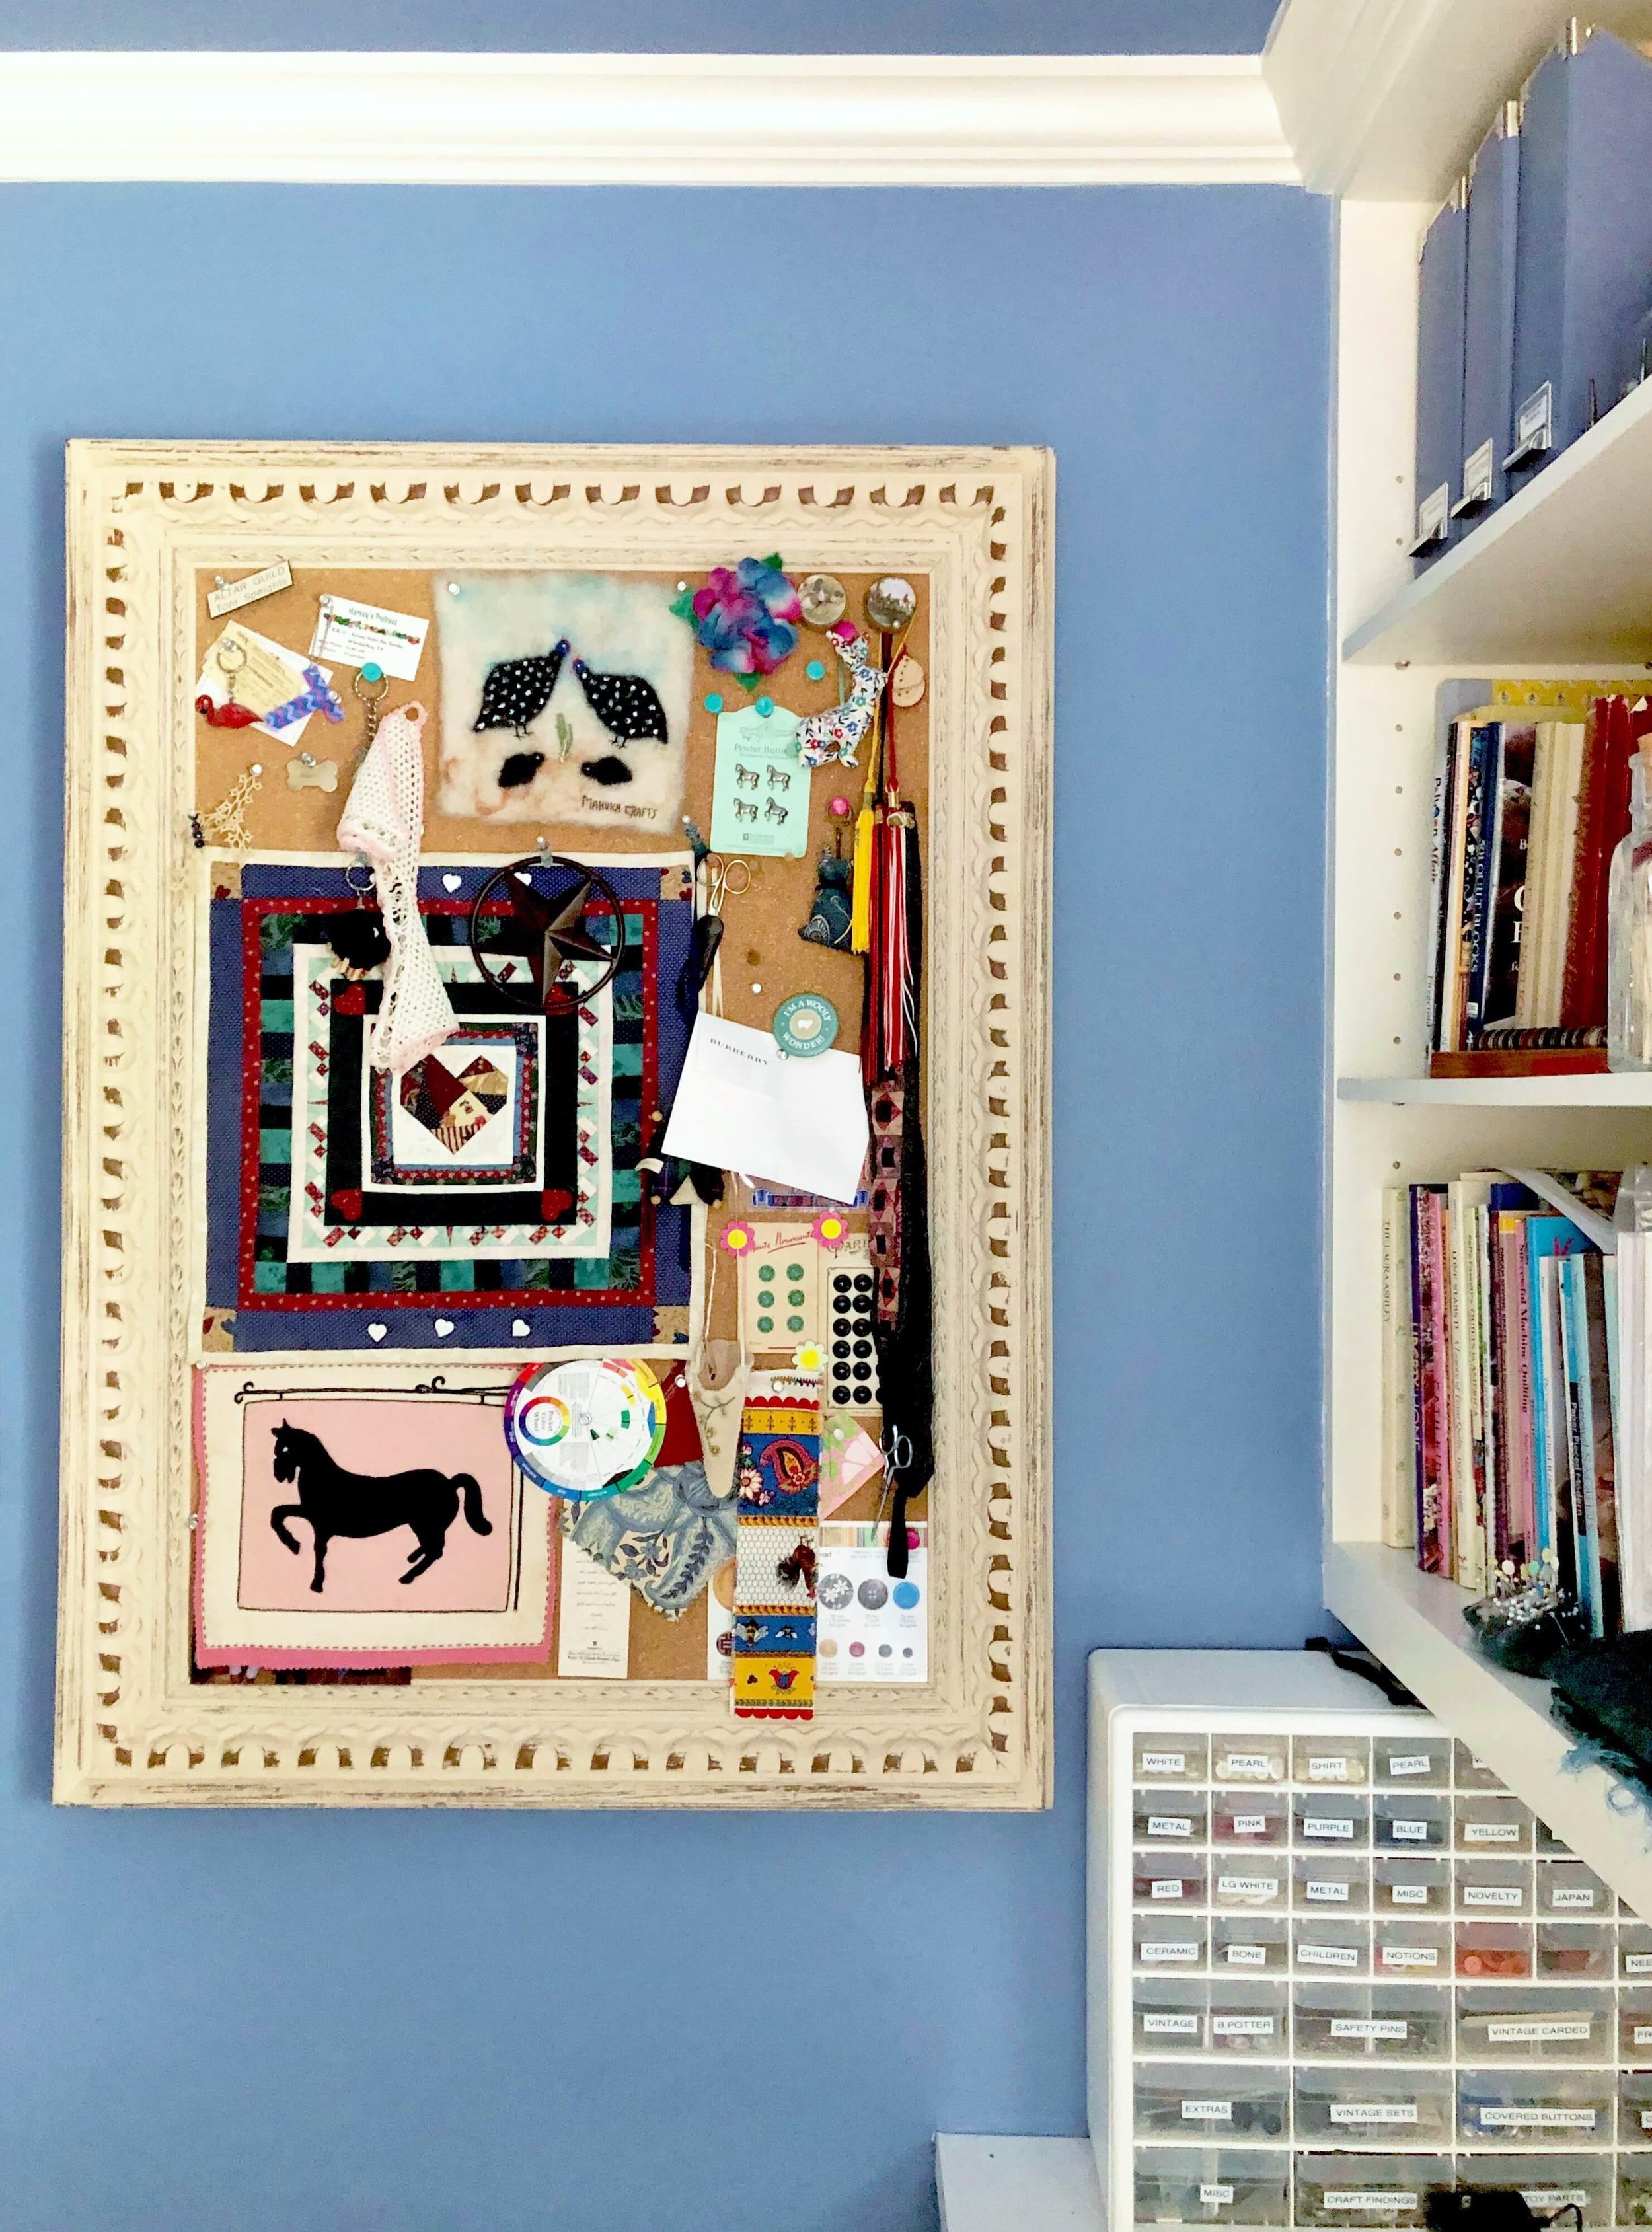 Periwinkle blue sewing room | Craft room organization, framed tackboard